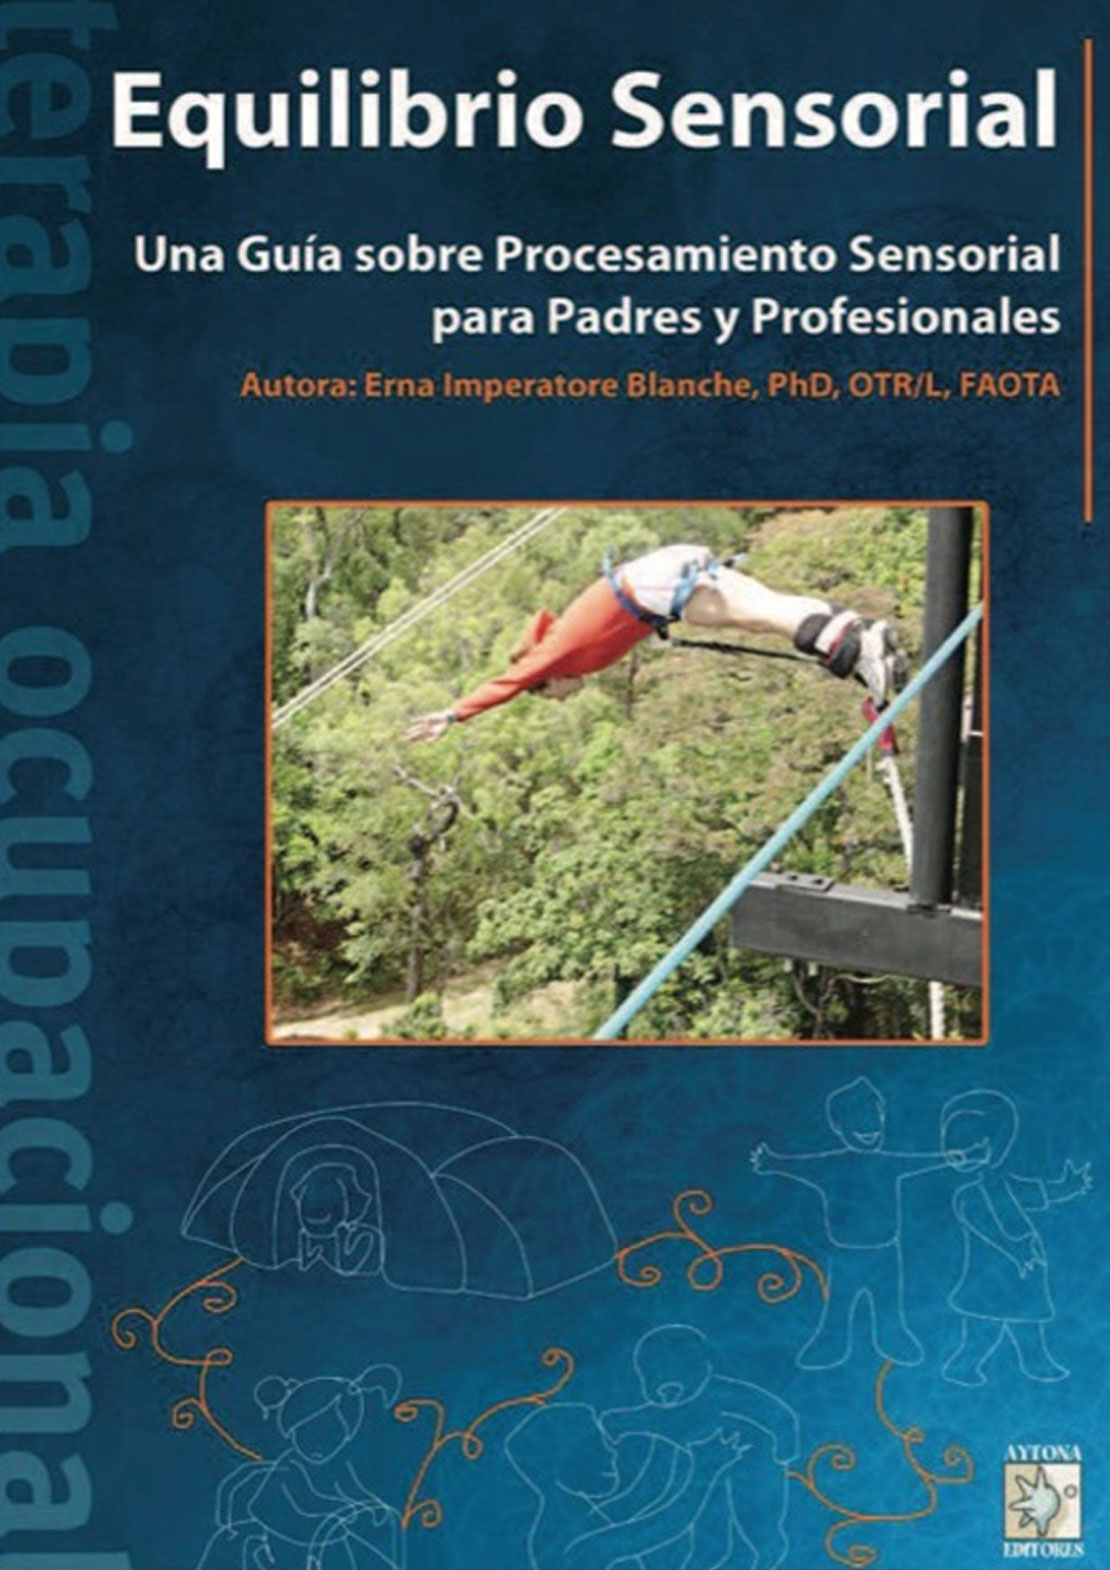 Libros Terapia Ocupacional Equilibrio sensorial